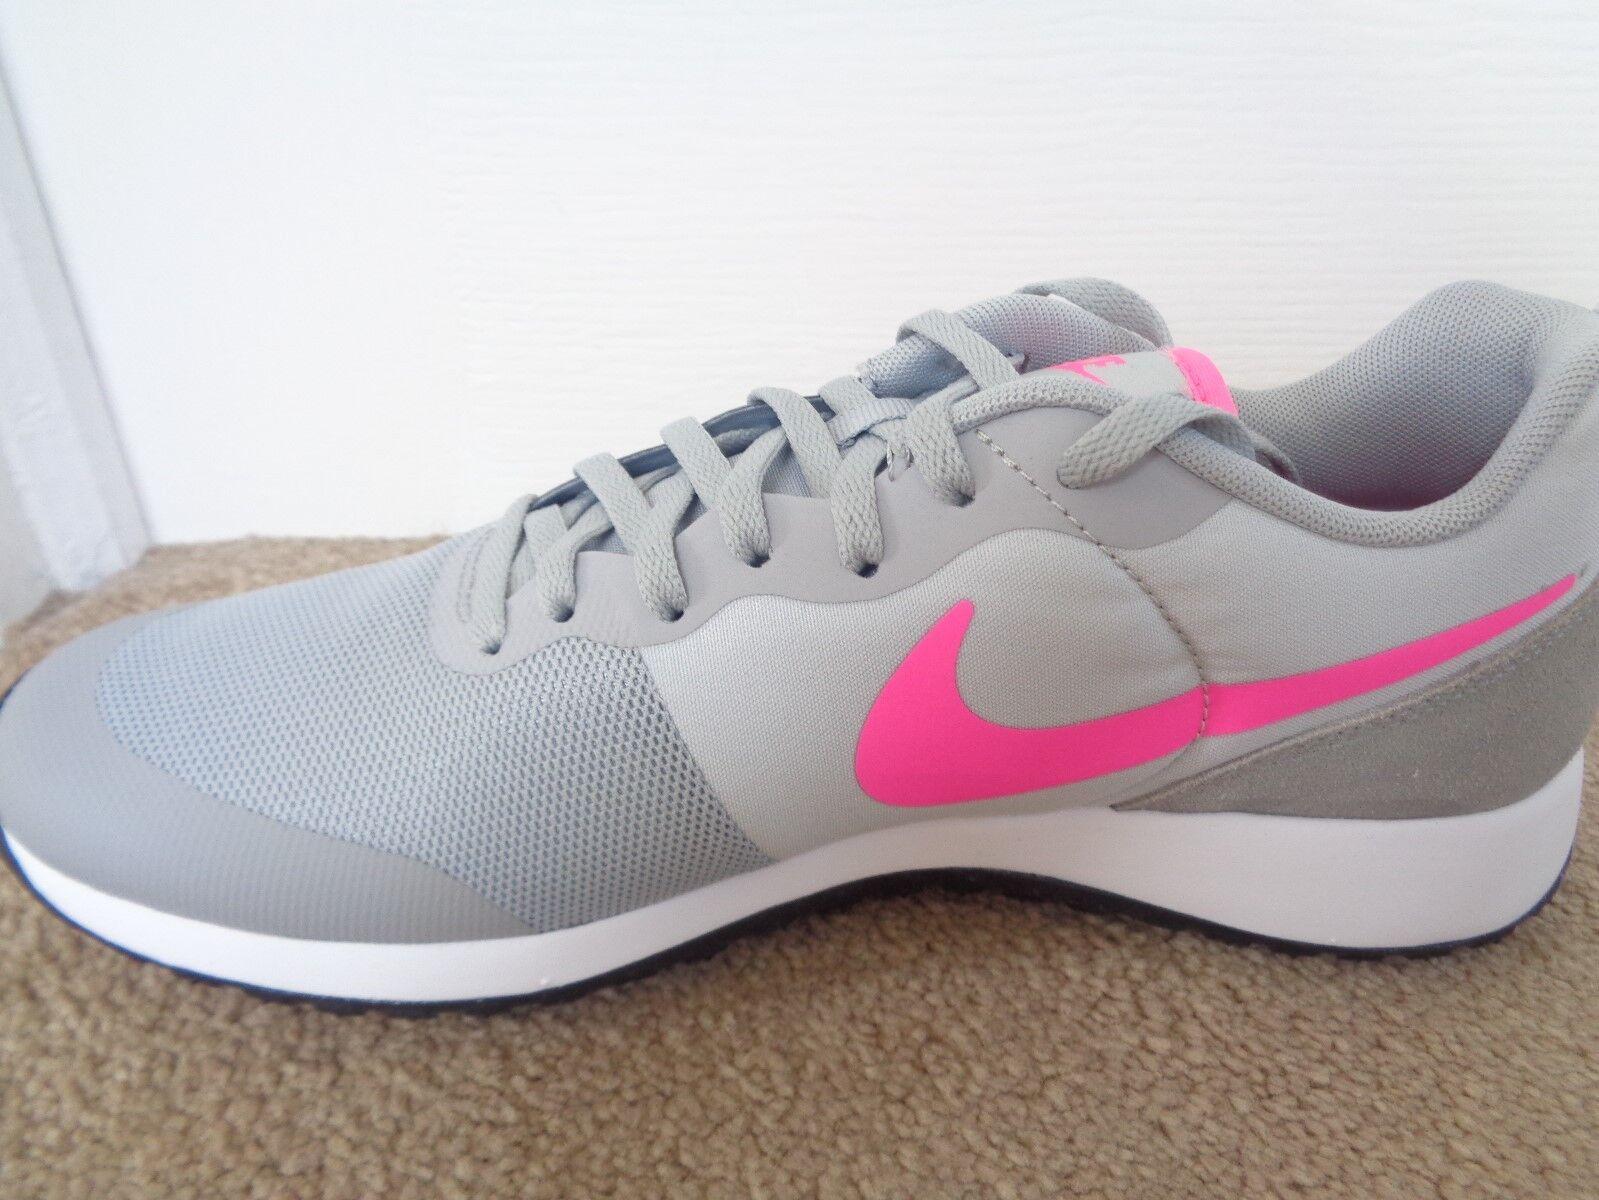 Nike Elite Shinsen wmns trainers 8 shoes 801781 051 uk 8 trainers eu 42.5 us 10.5 NEW+BOX c0e773